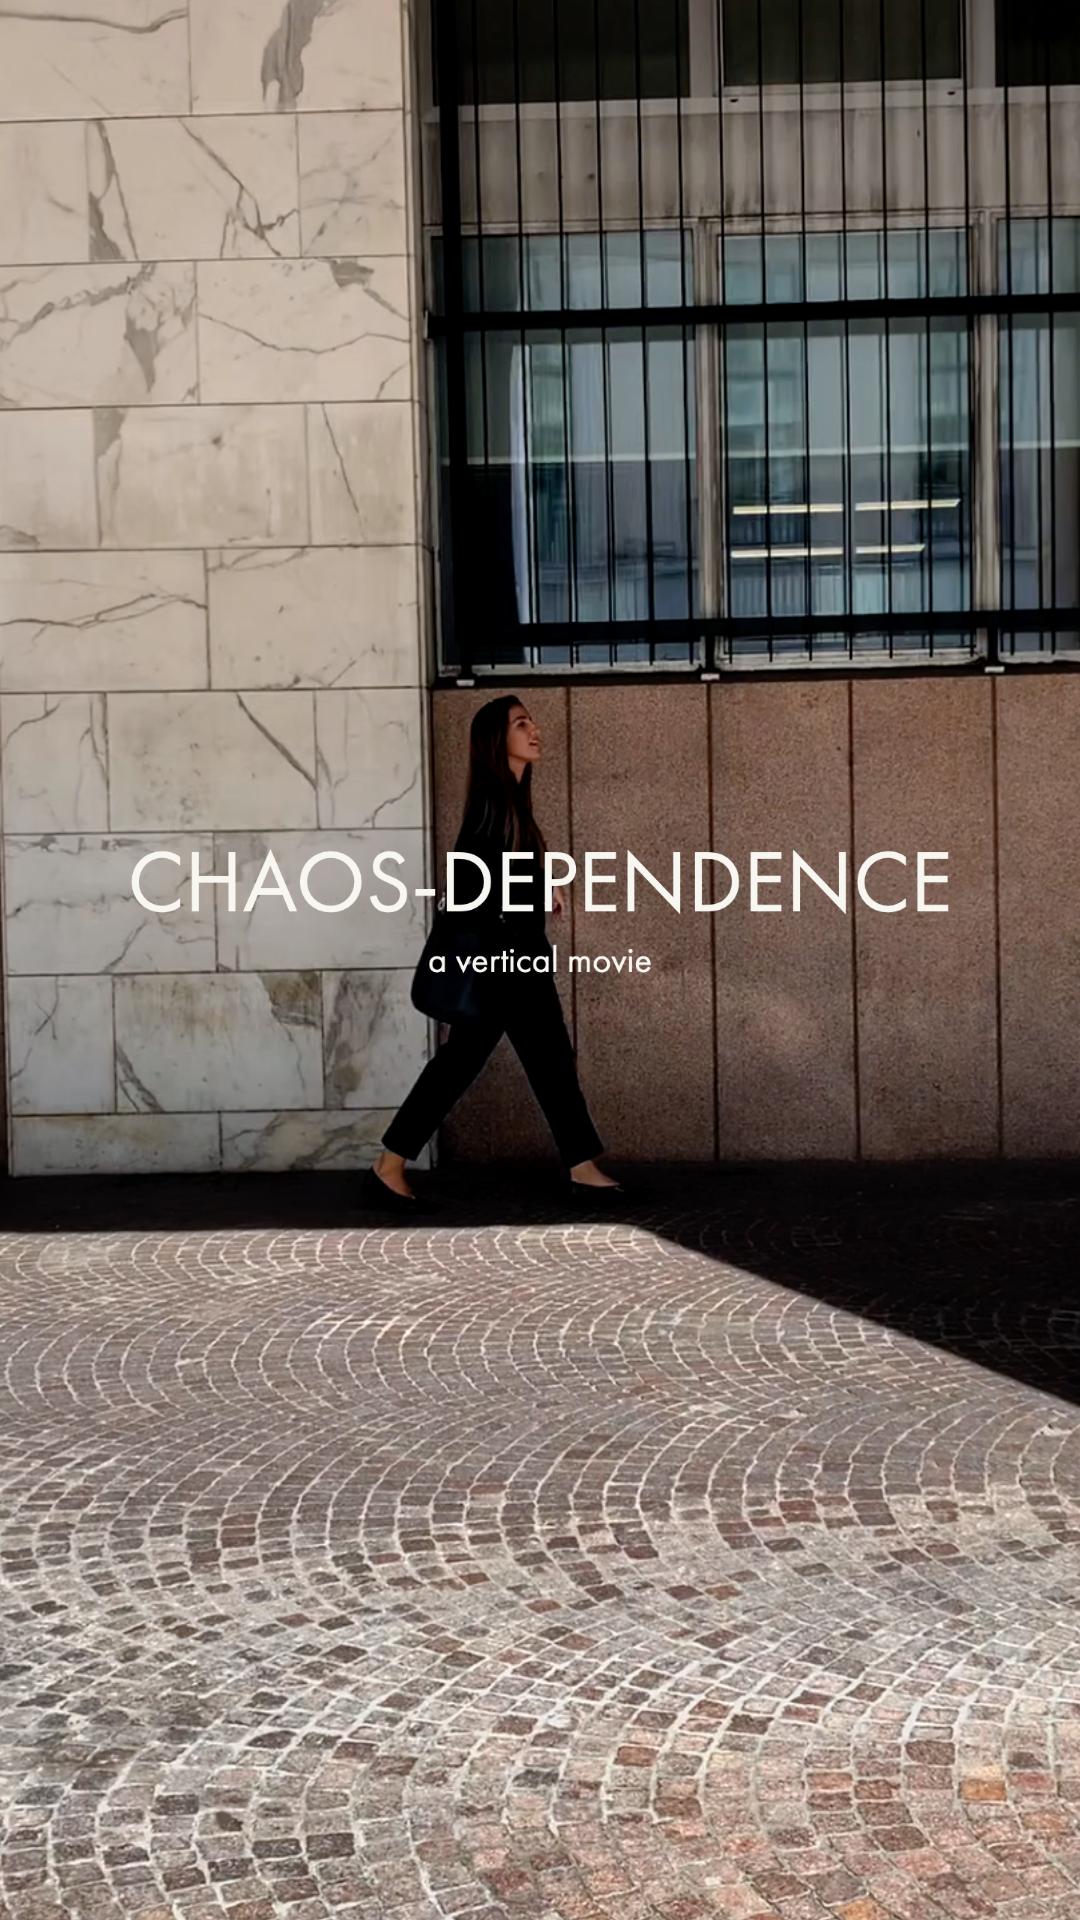 Carica la locandina: CHAOS-DEPENDENCE.png